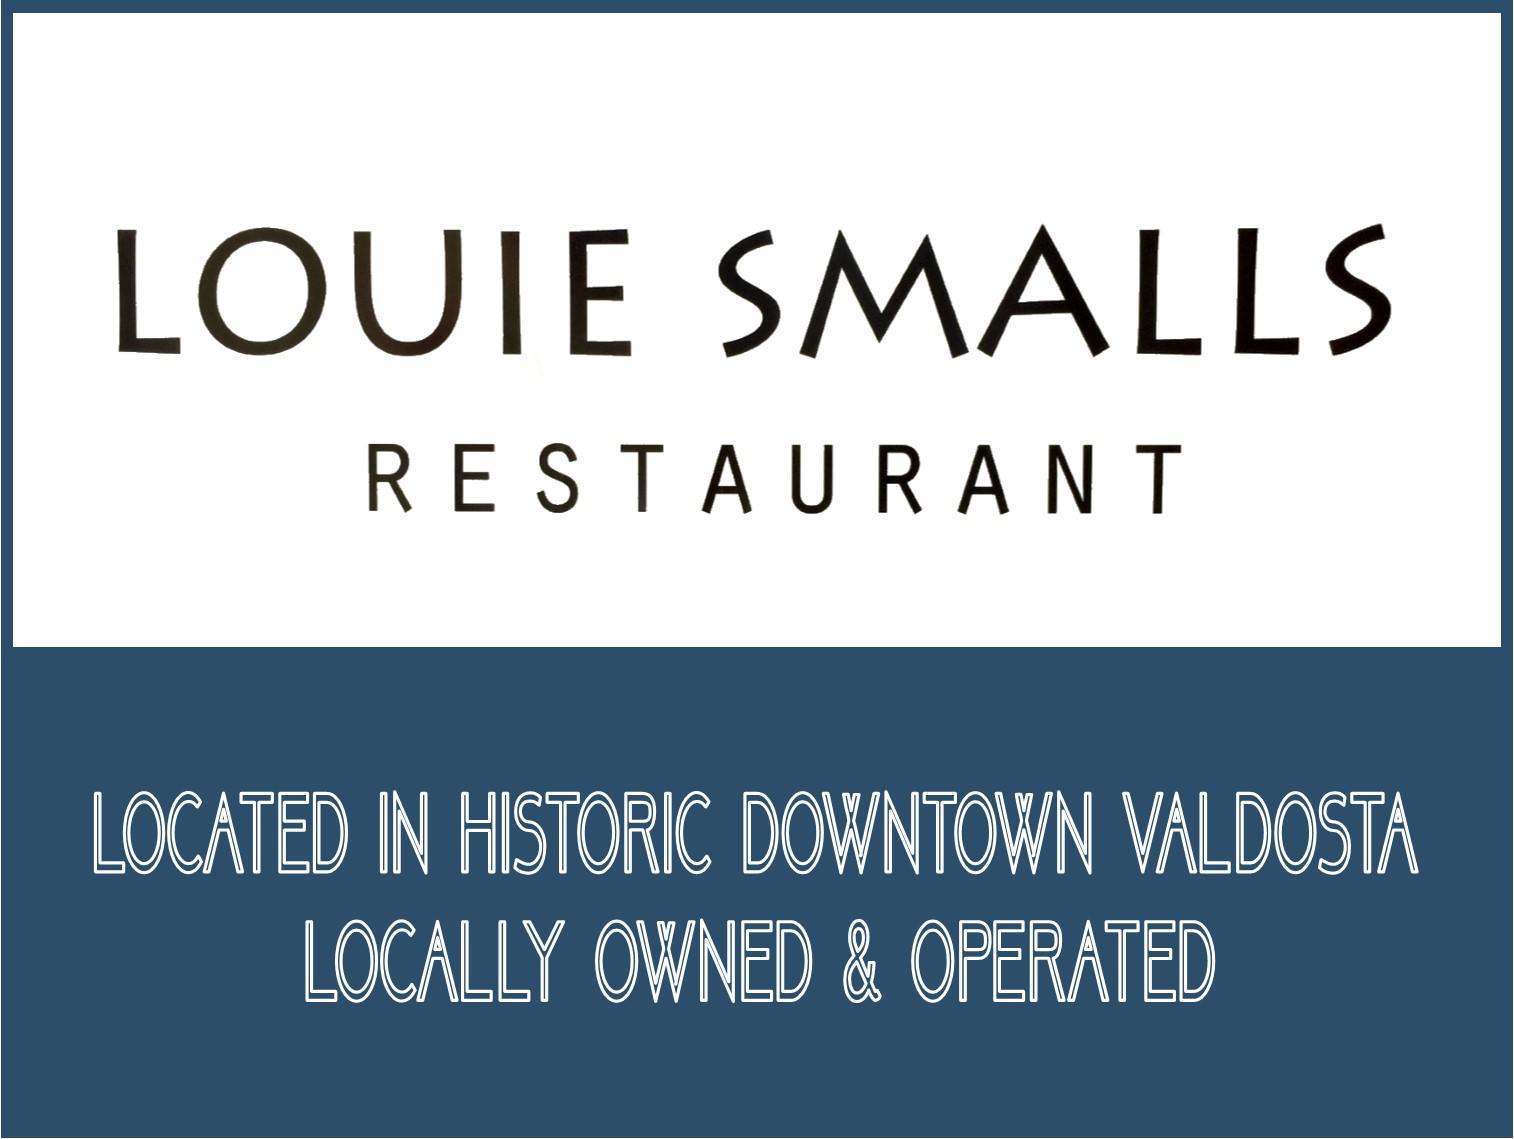 Louie Smalls